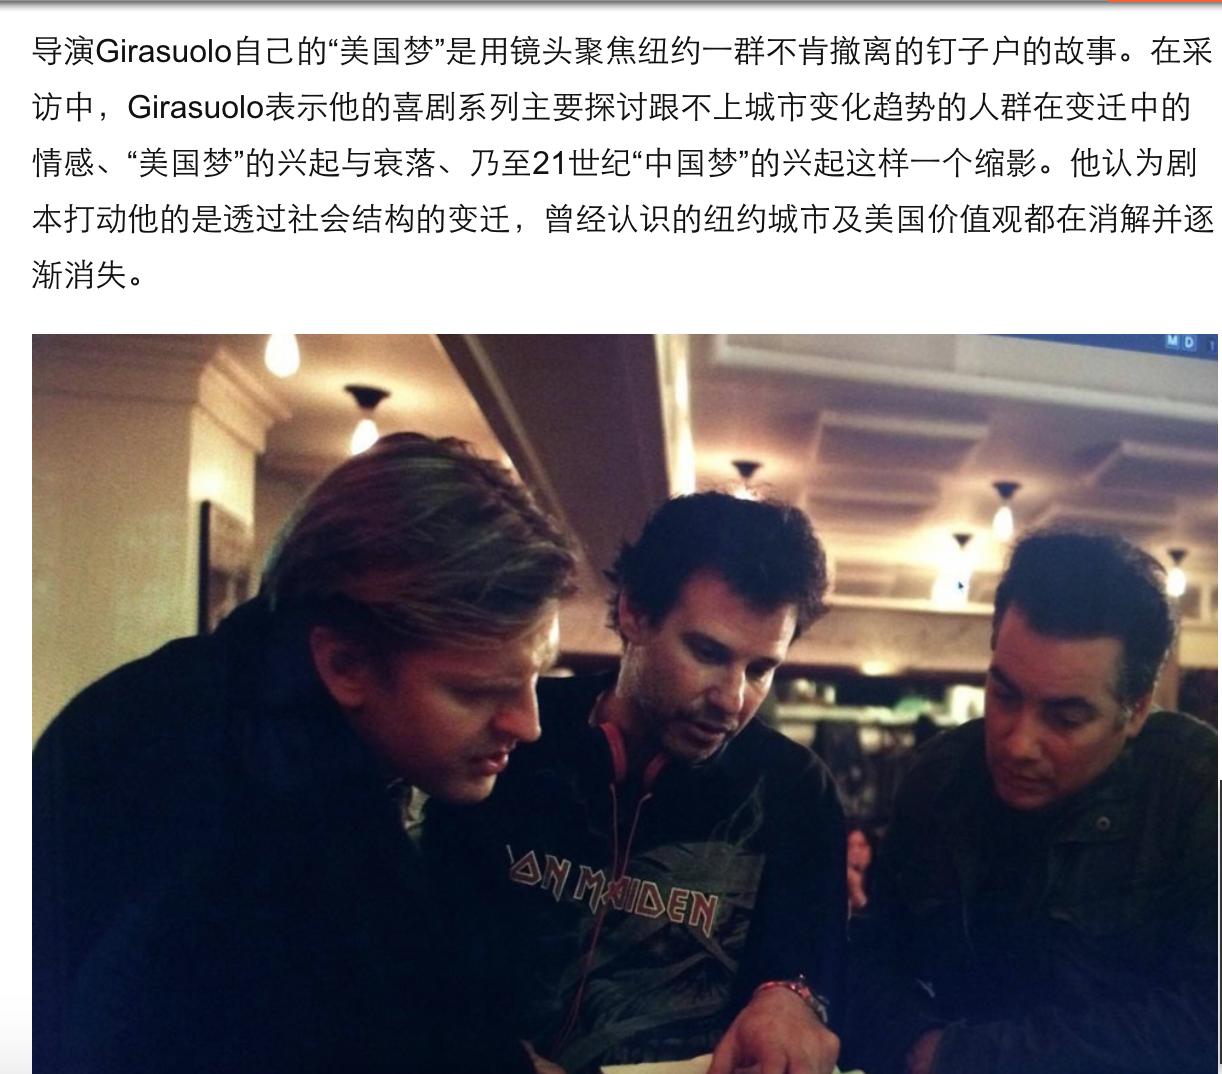 Duowei News, August 4, 2016